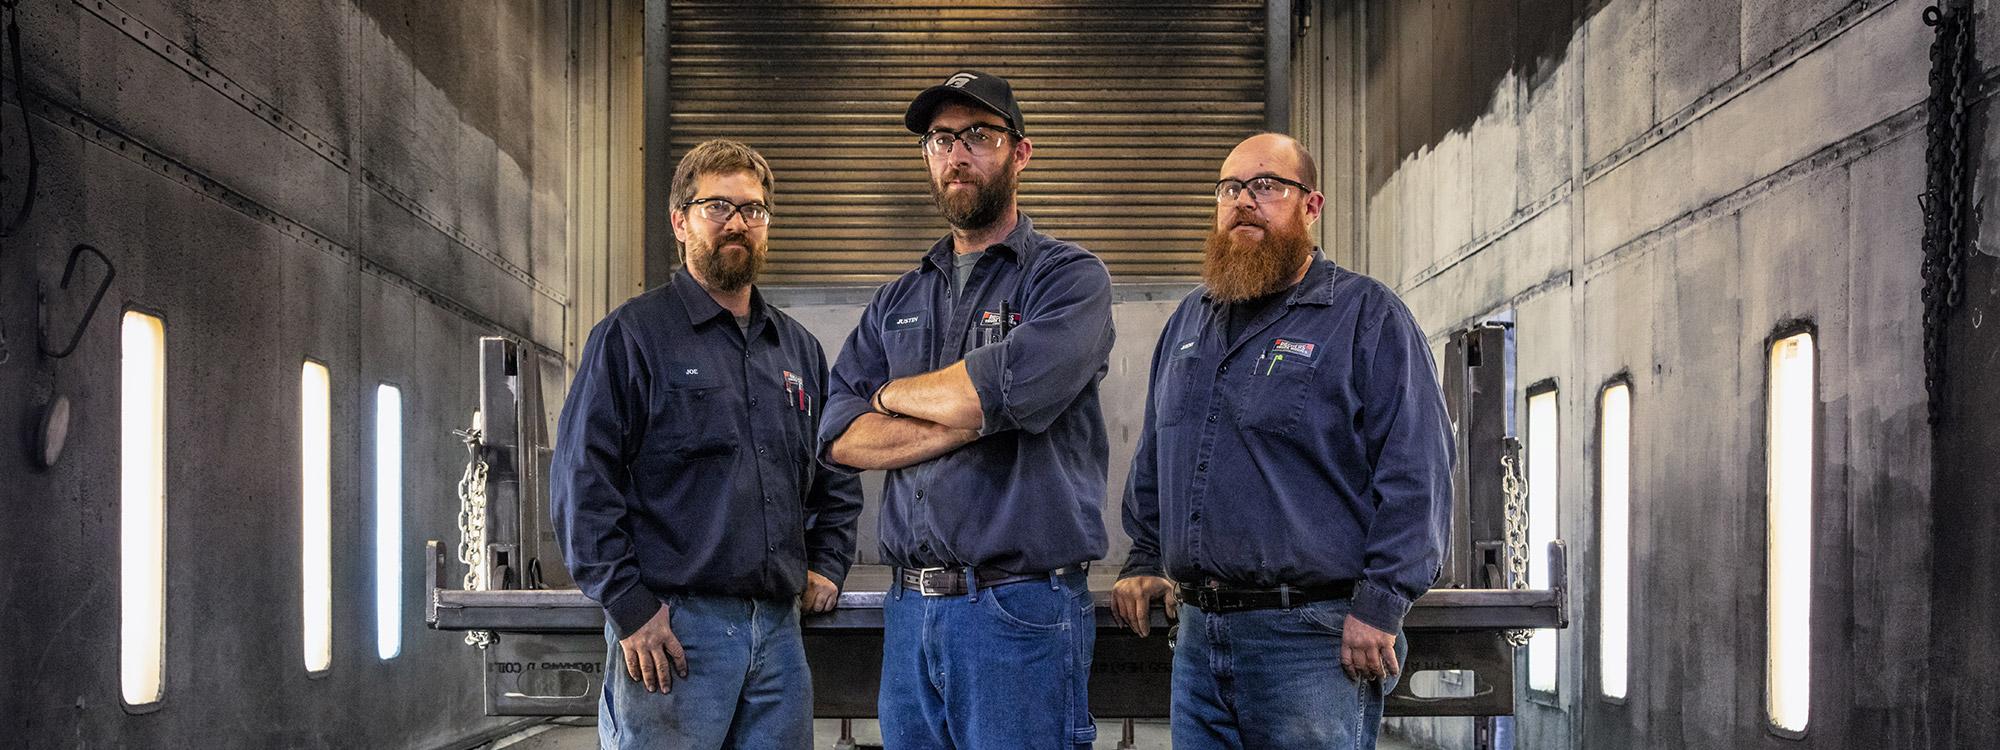 Riechers Truck Bodies Career Opportunities